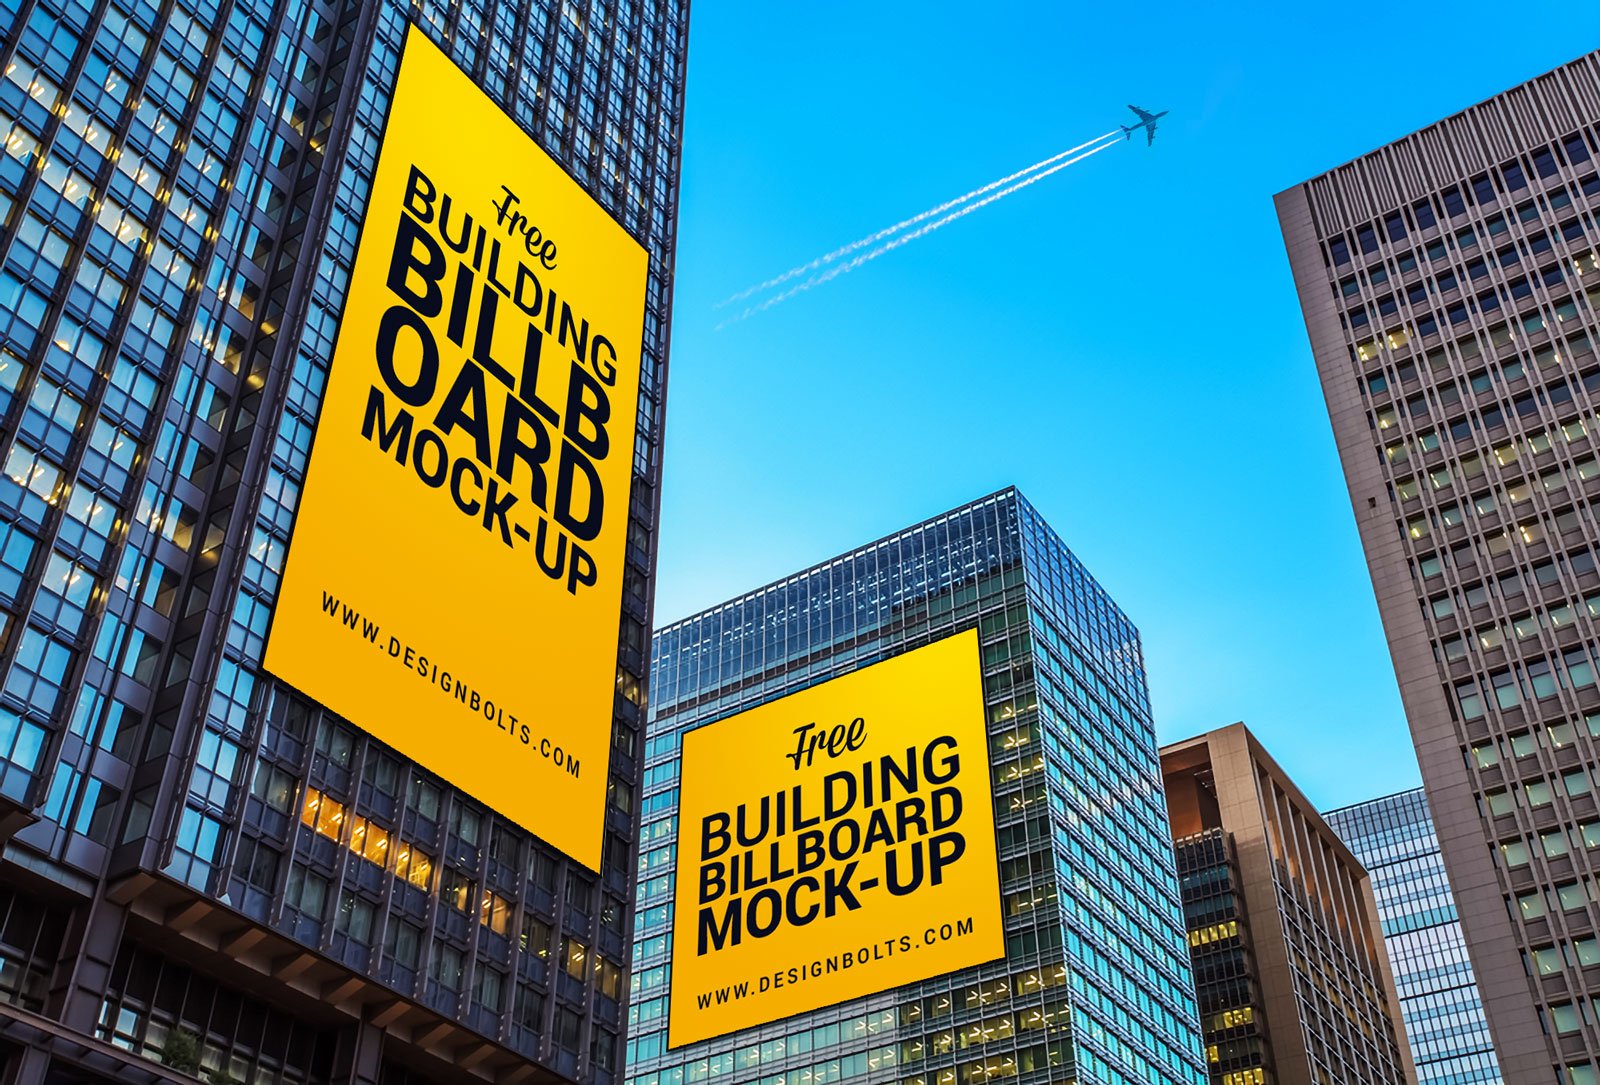 Free Outdoor Advertising Building Billboard Mockup PSD ...